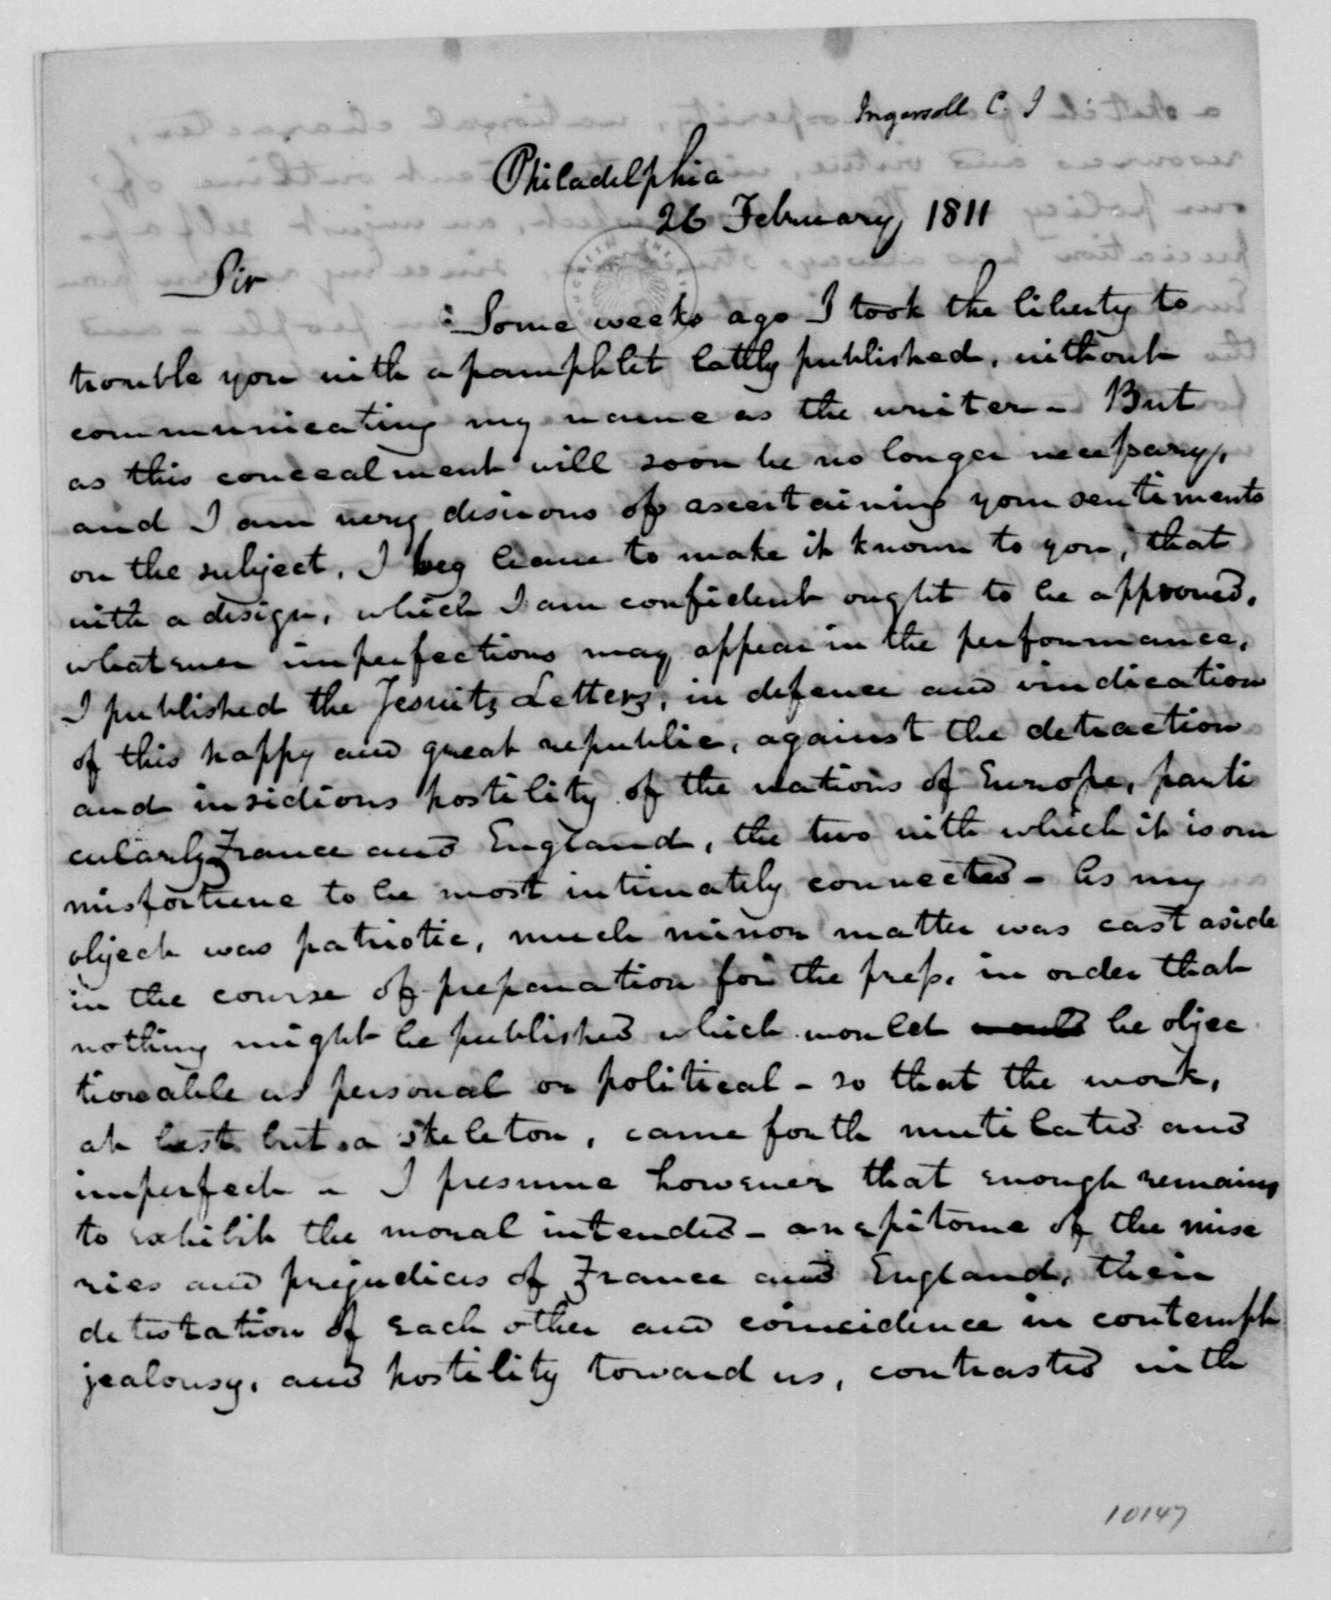 Charles J. Ingersoll to James Madison, February 26, 1811.